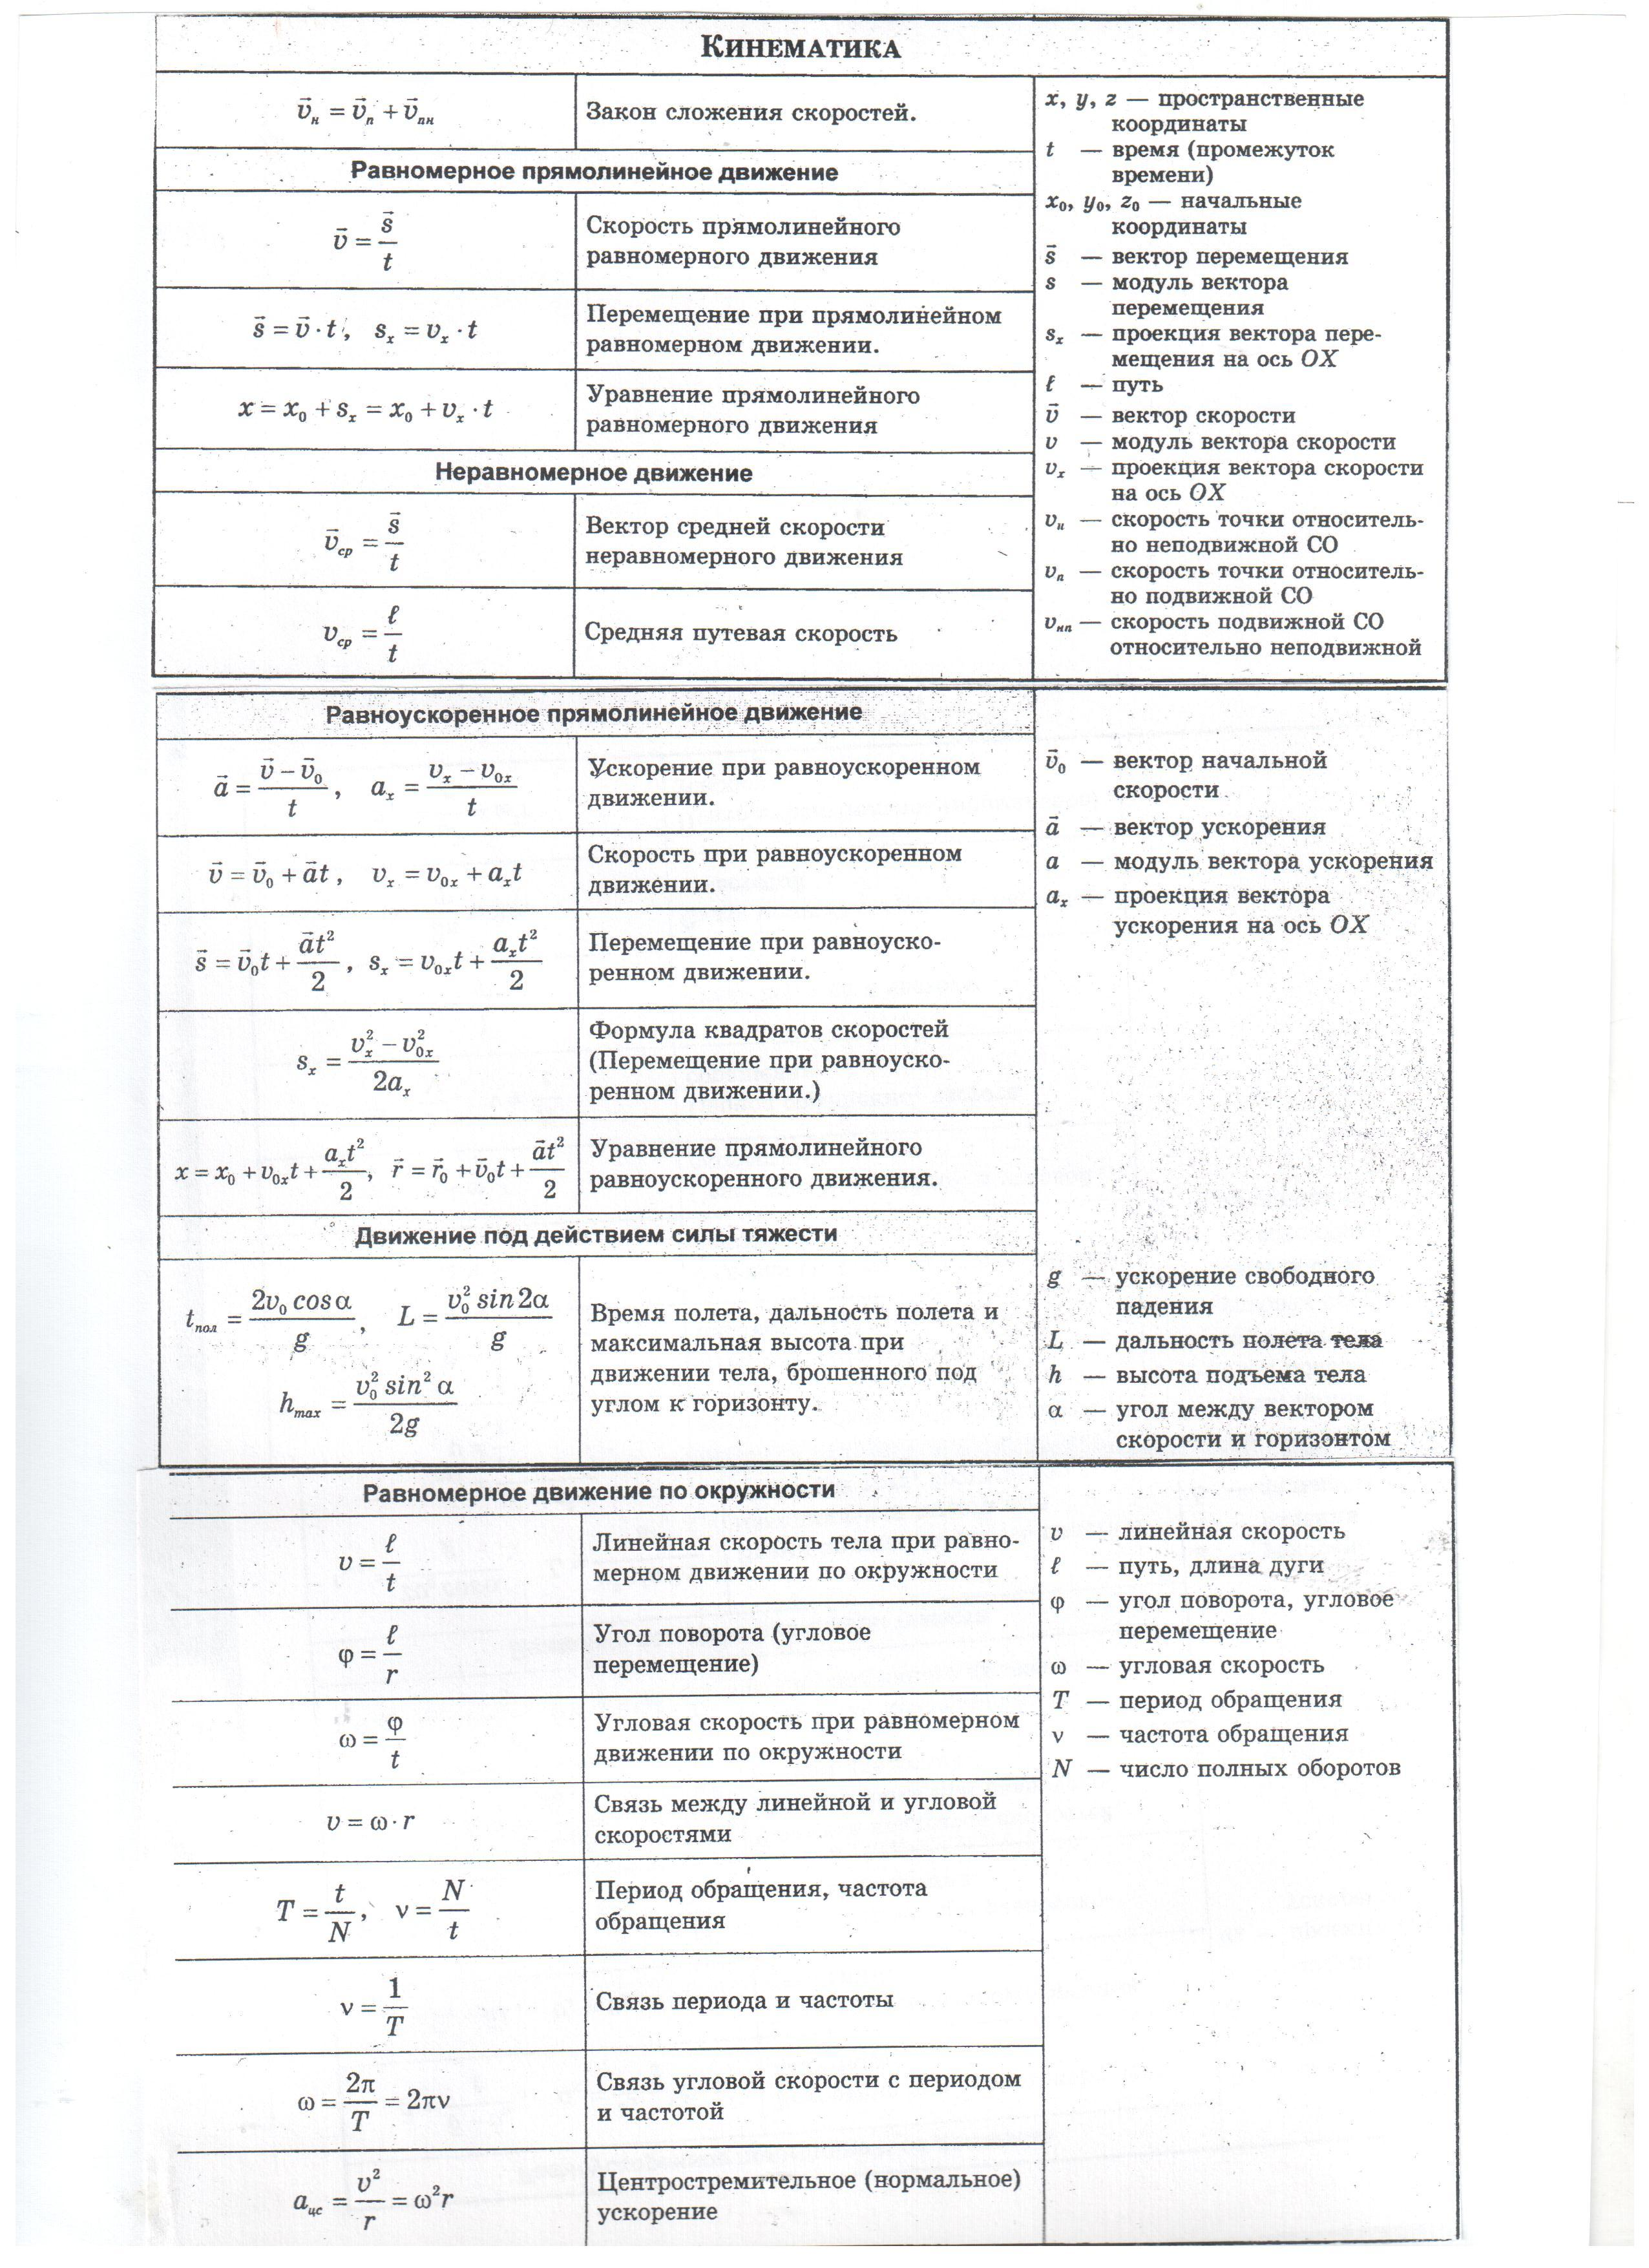 Формулы физика картинка пояснение